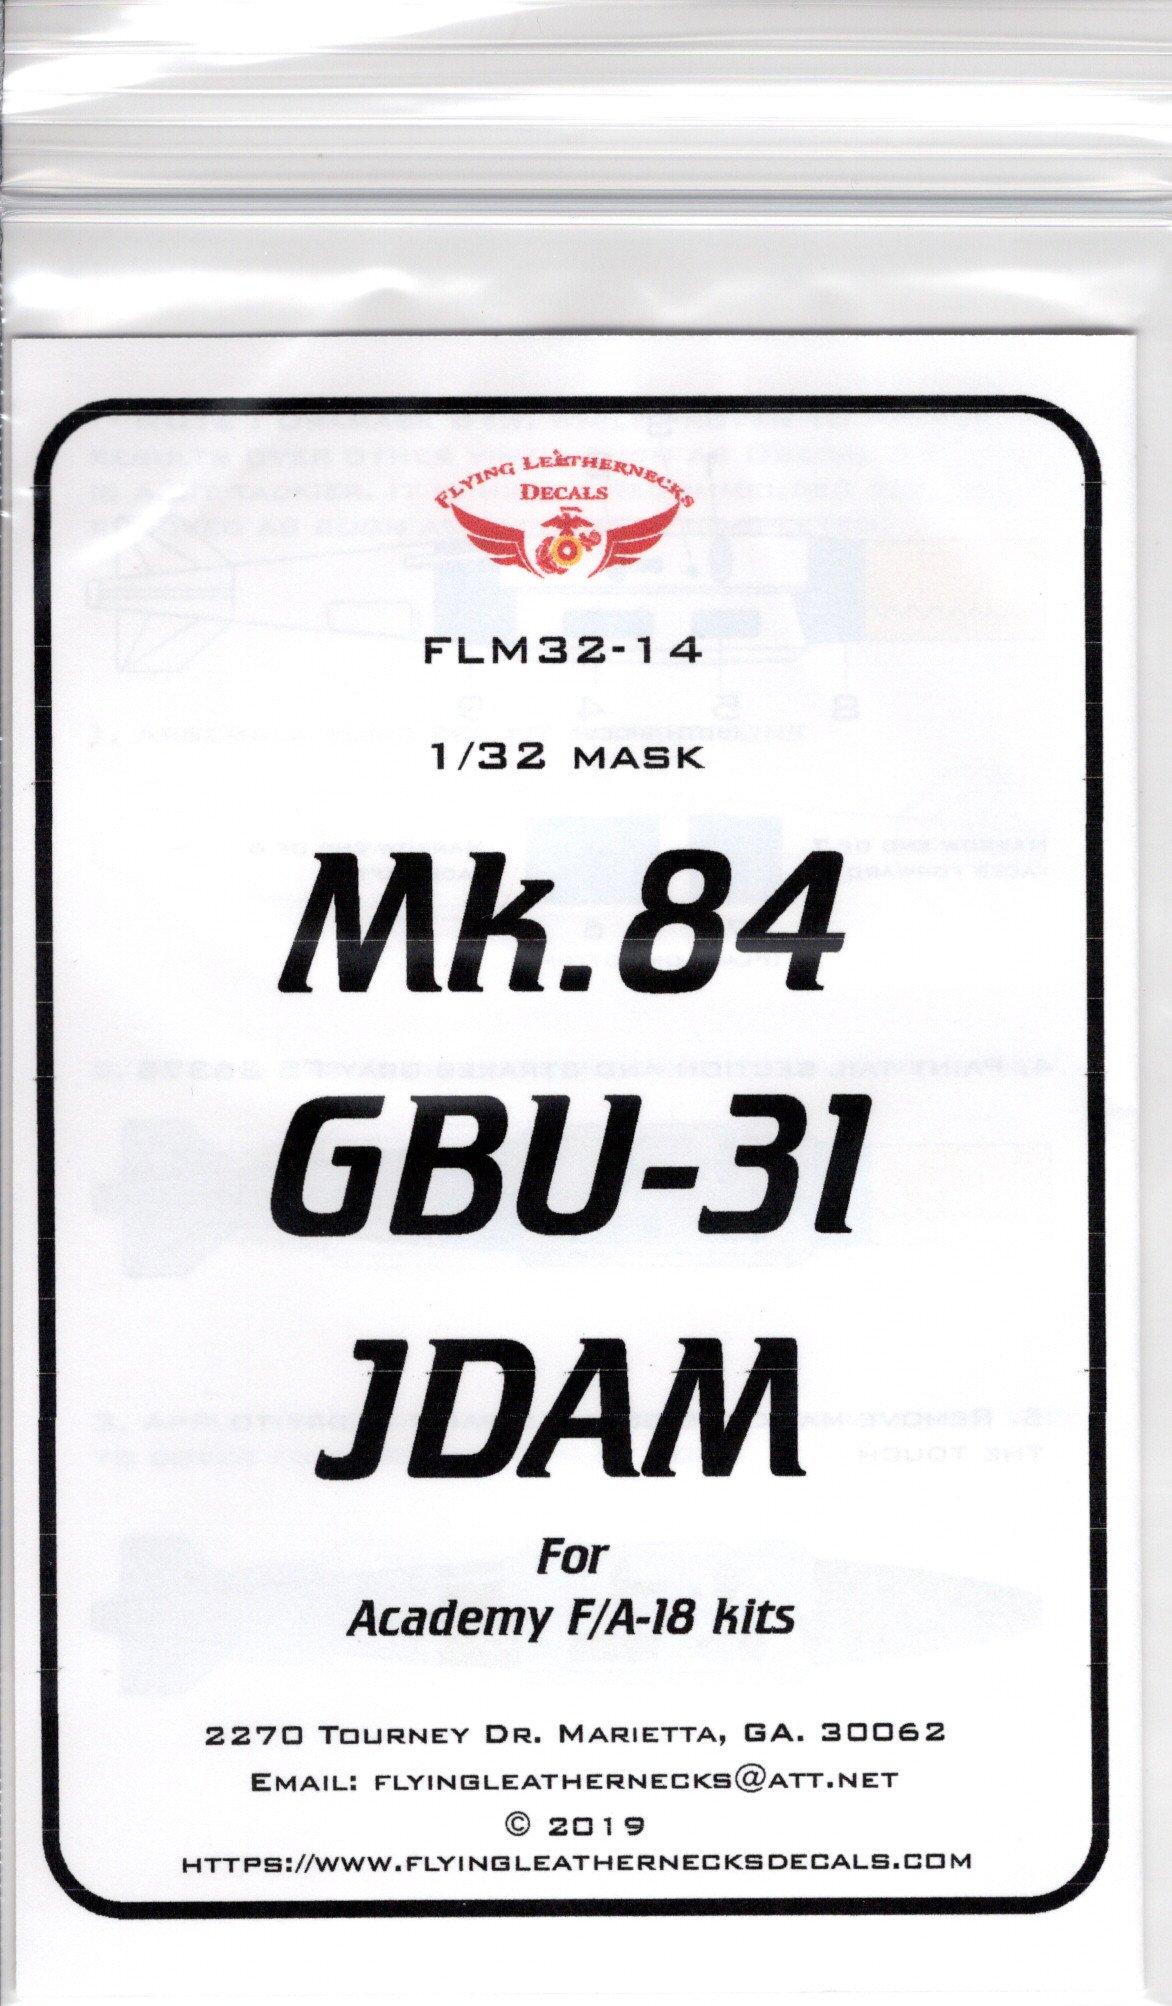 FLM32-14